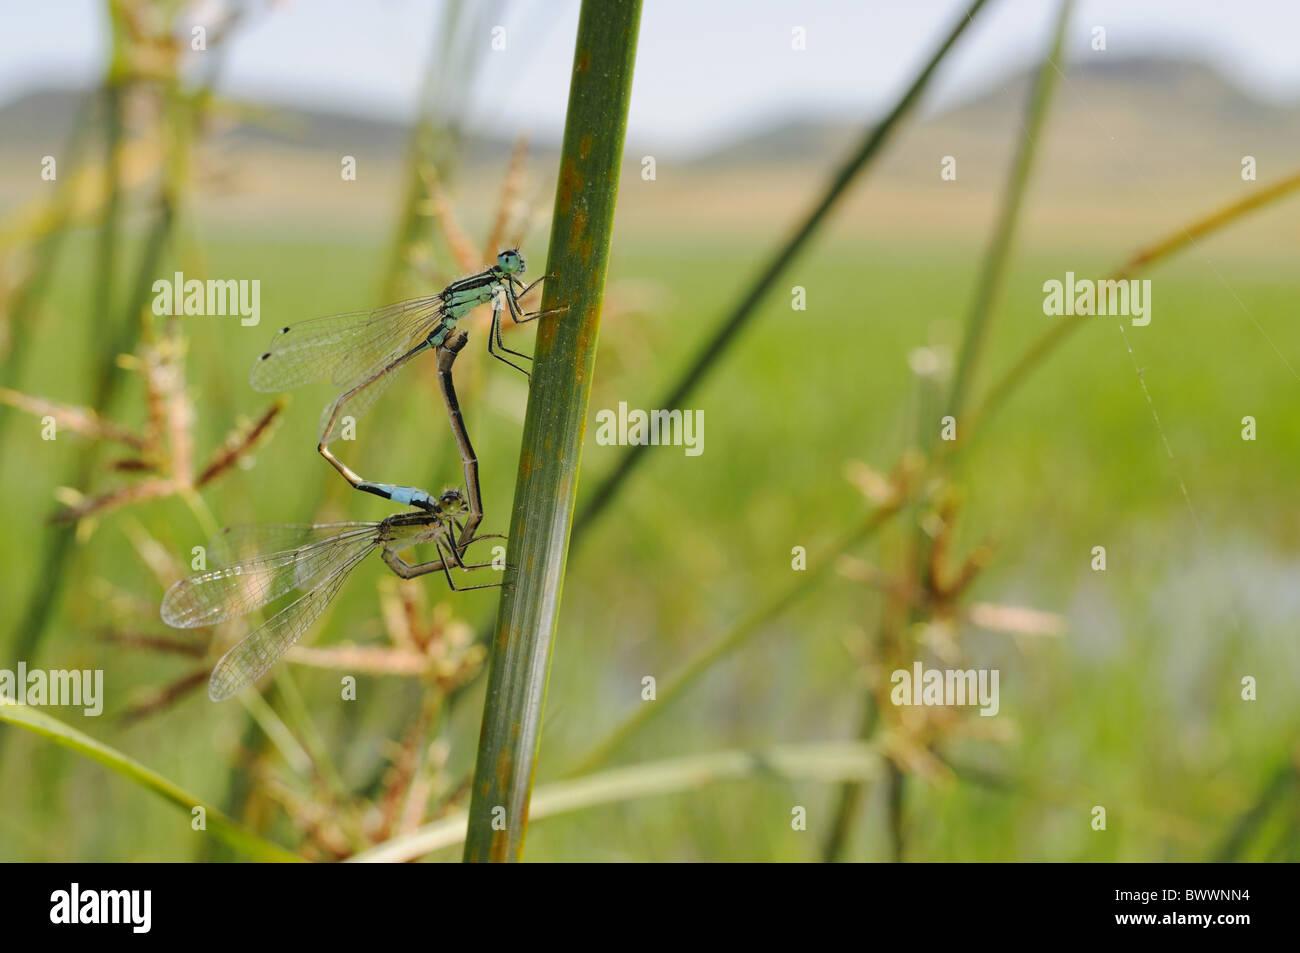 damselfly freshwater insect Invertebrates Ischnura genei Italy mating Odonata rare species Sardinia invertebrate Stock Photo